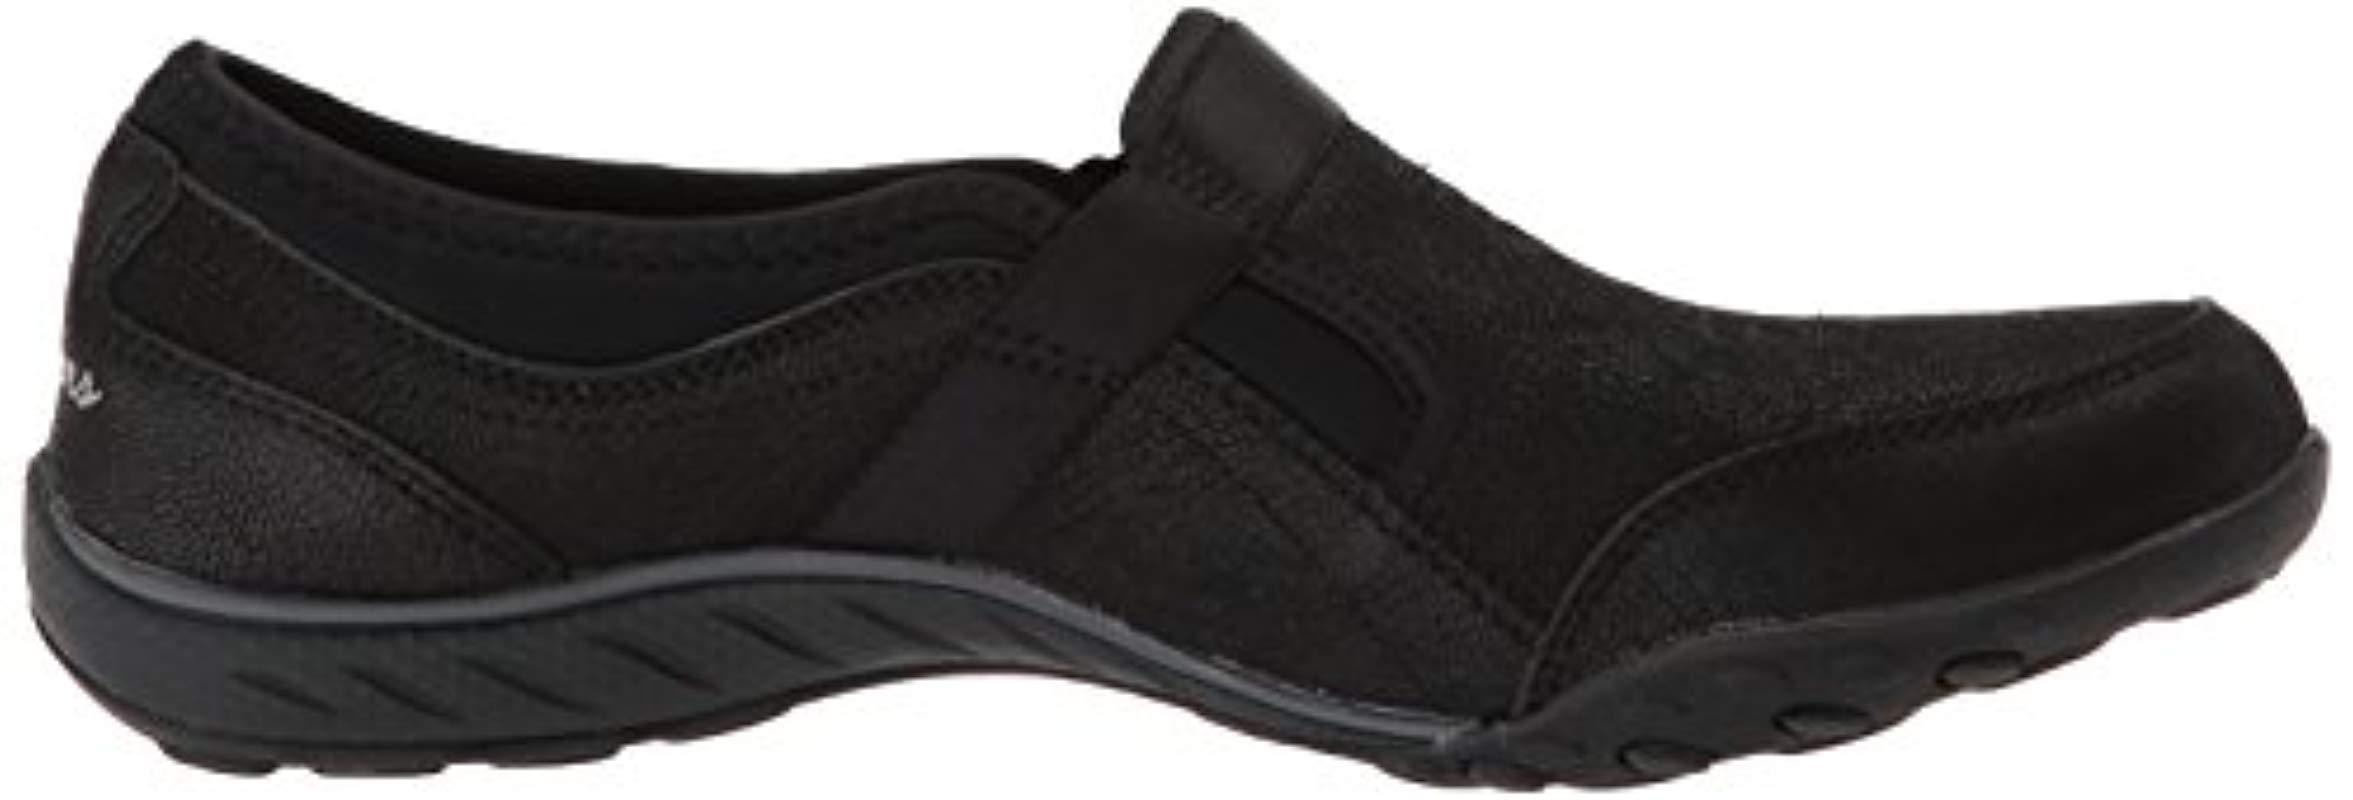 Skechers 's Breathe Easy Take On Anything Sneaker in Black